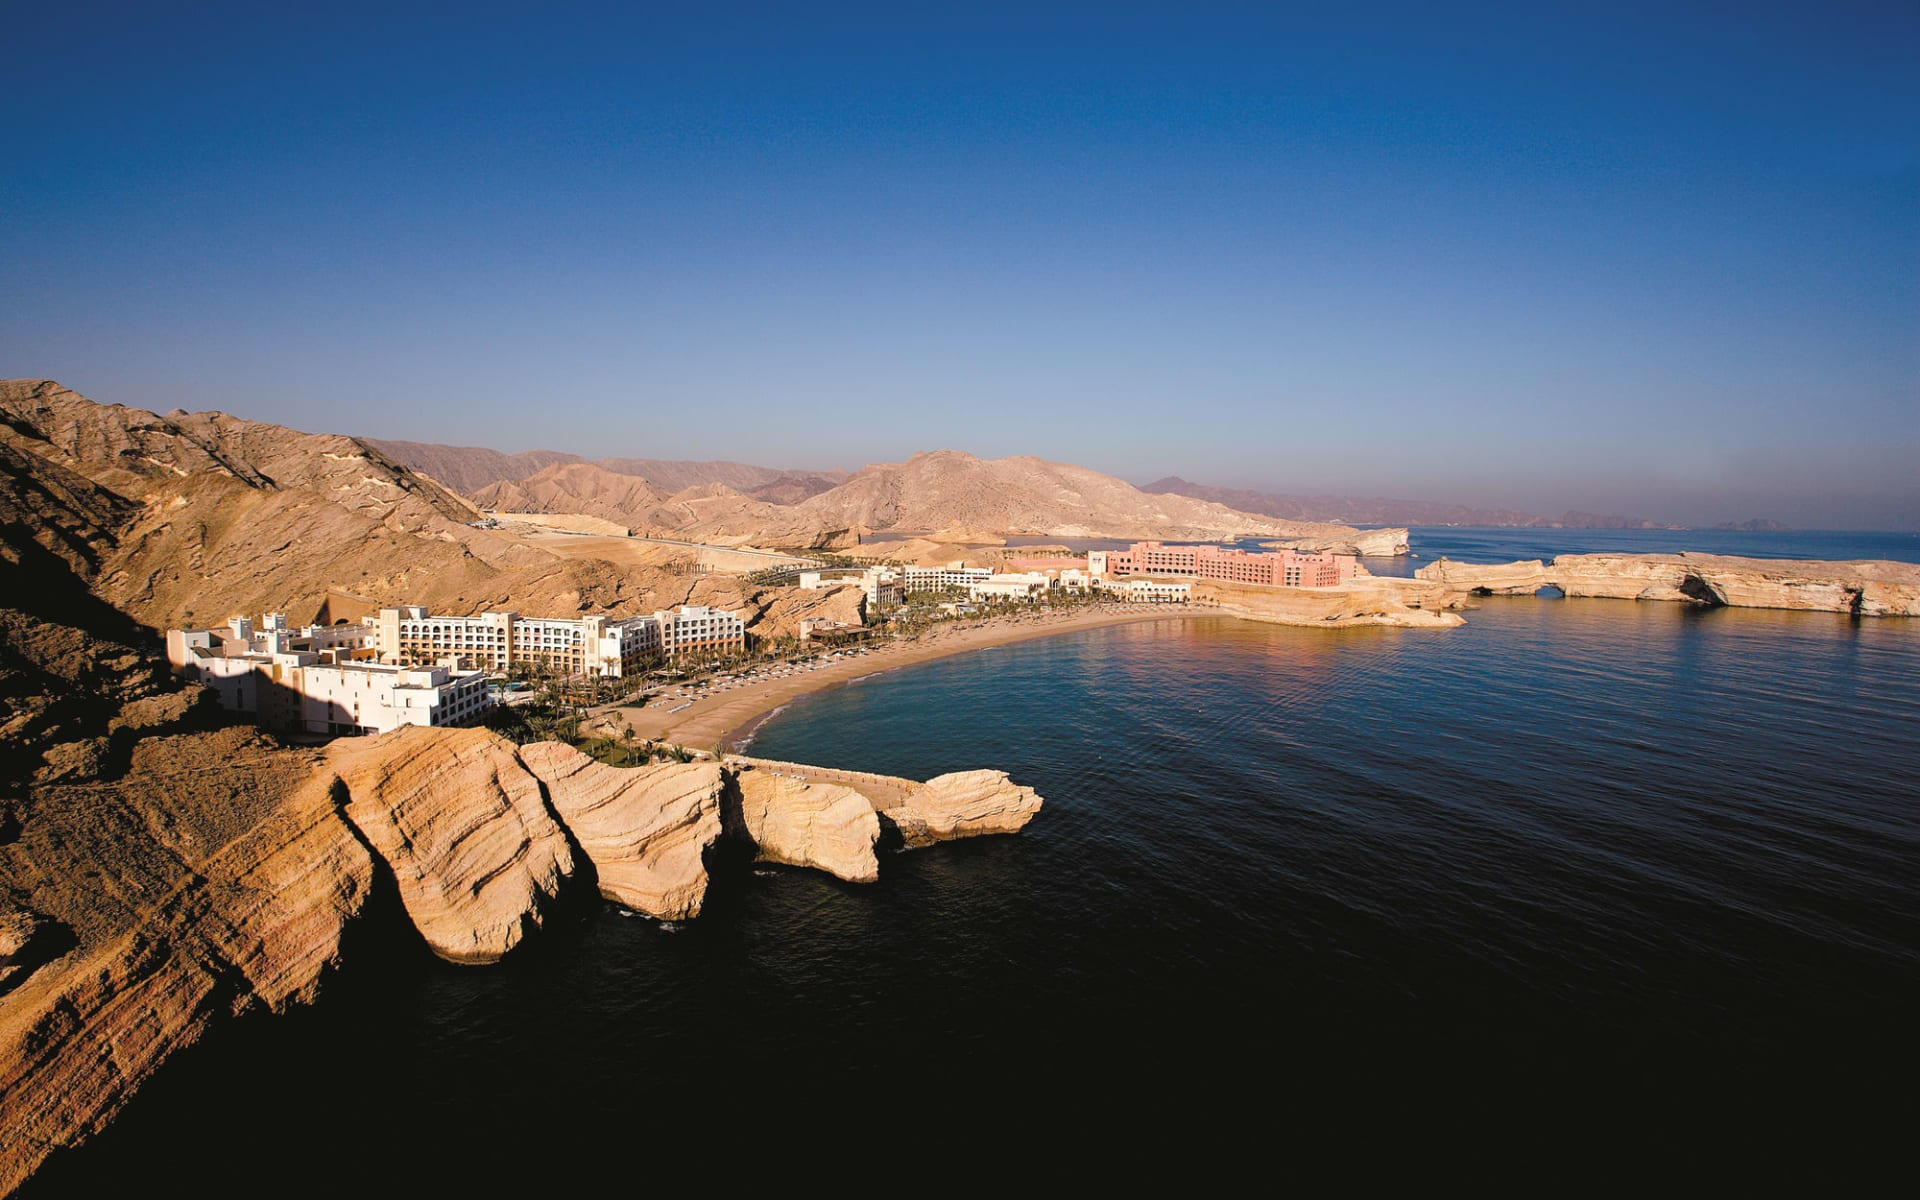 Al Waha (Shangri-La's Barr al Jissah Resort & Spa) in Muscat: